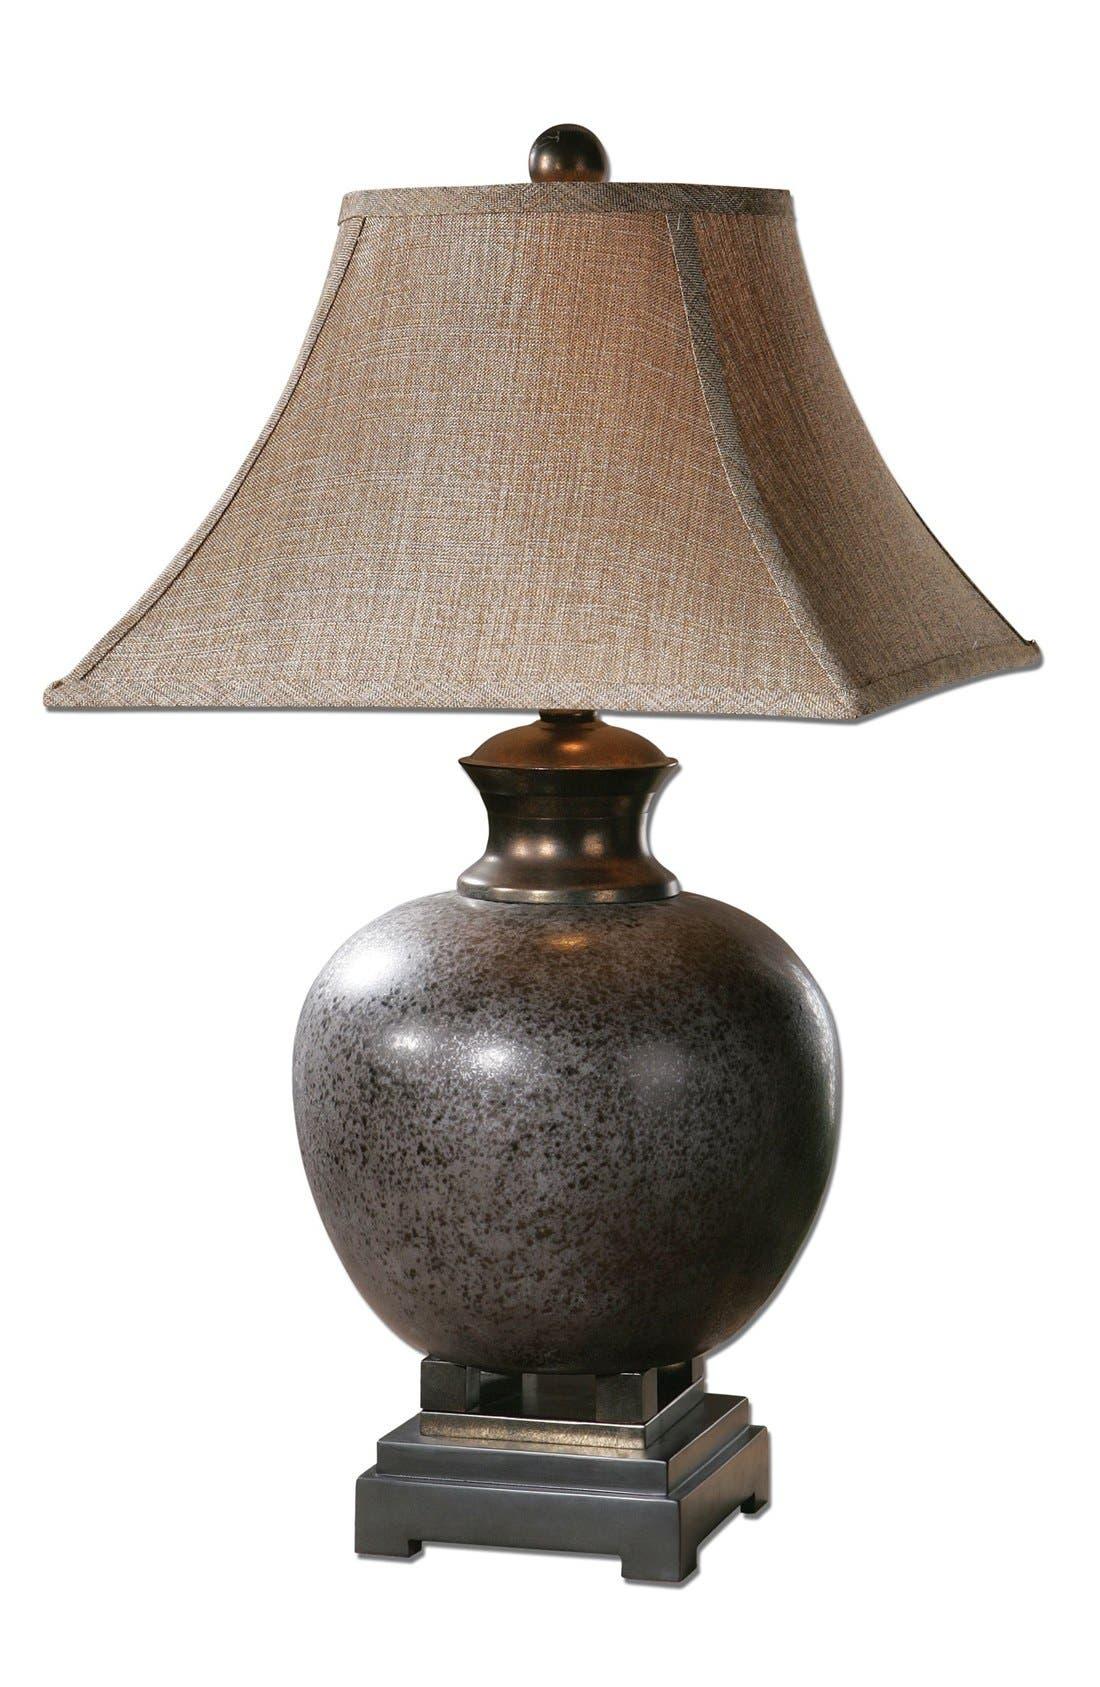 Main Image - Uttermost 'Villaga' Ceramic Table Lamp